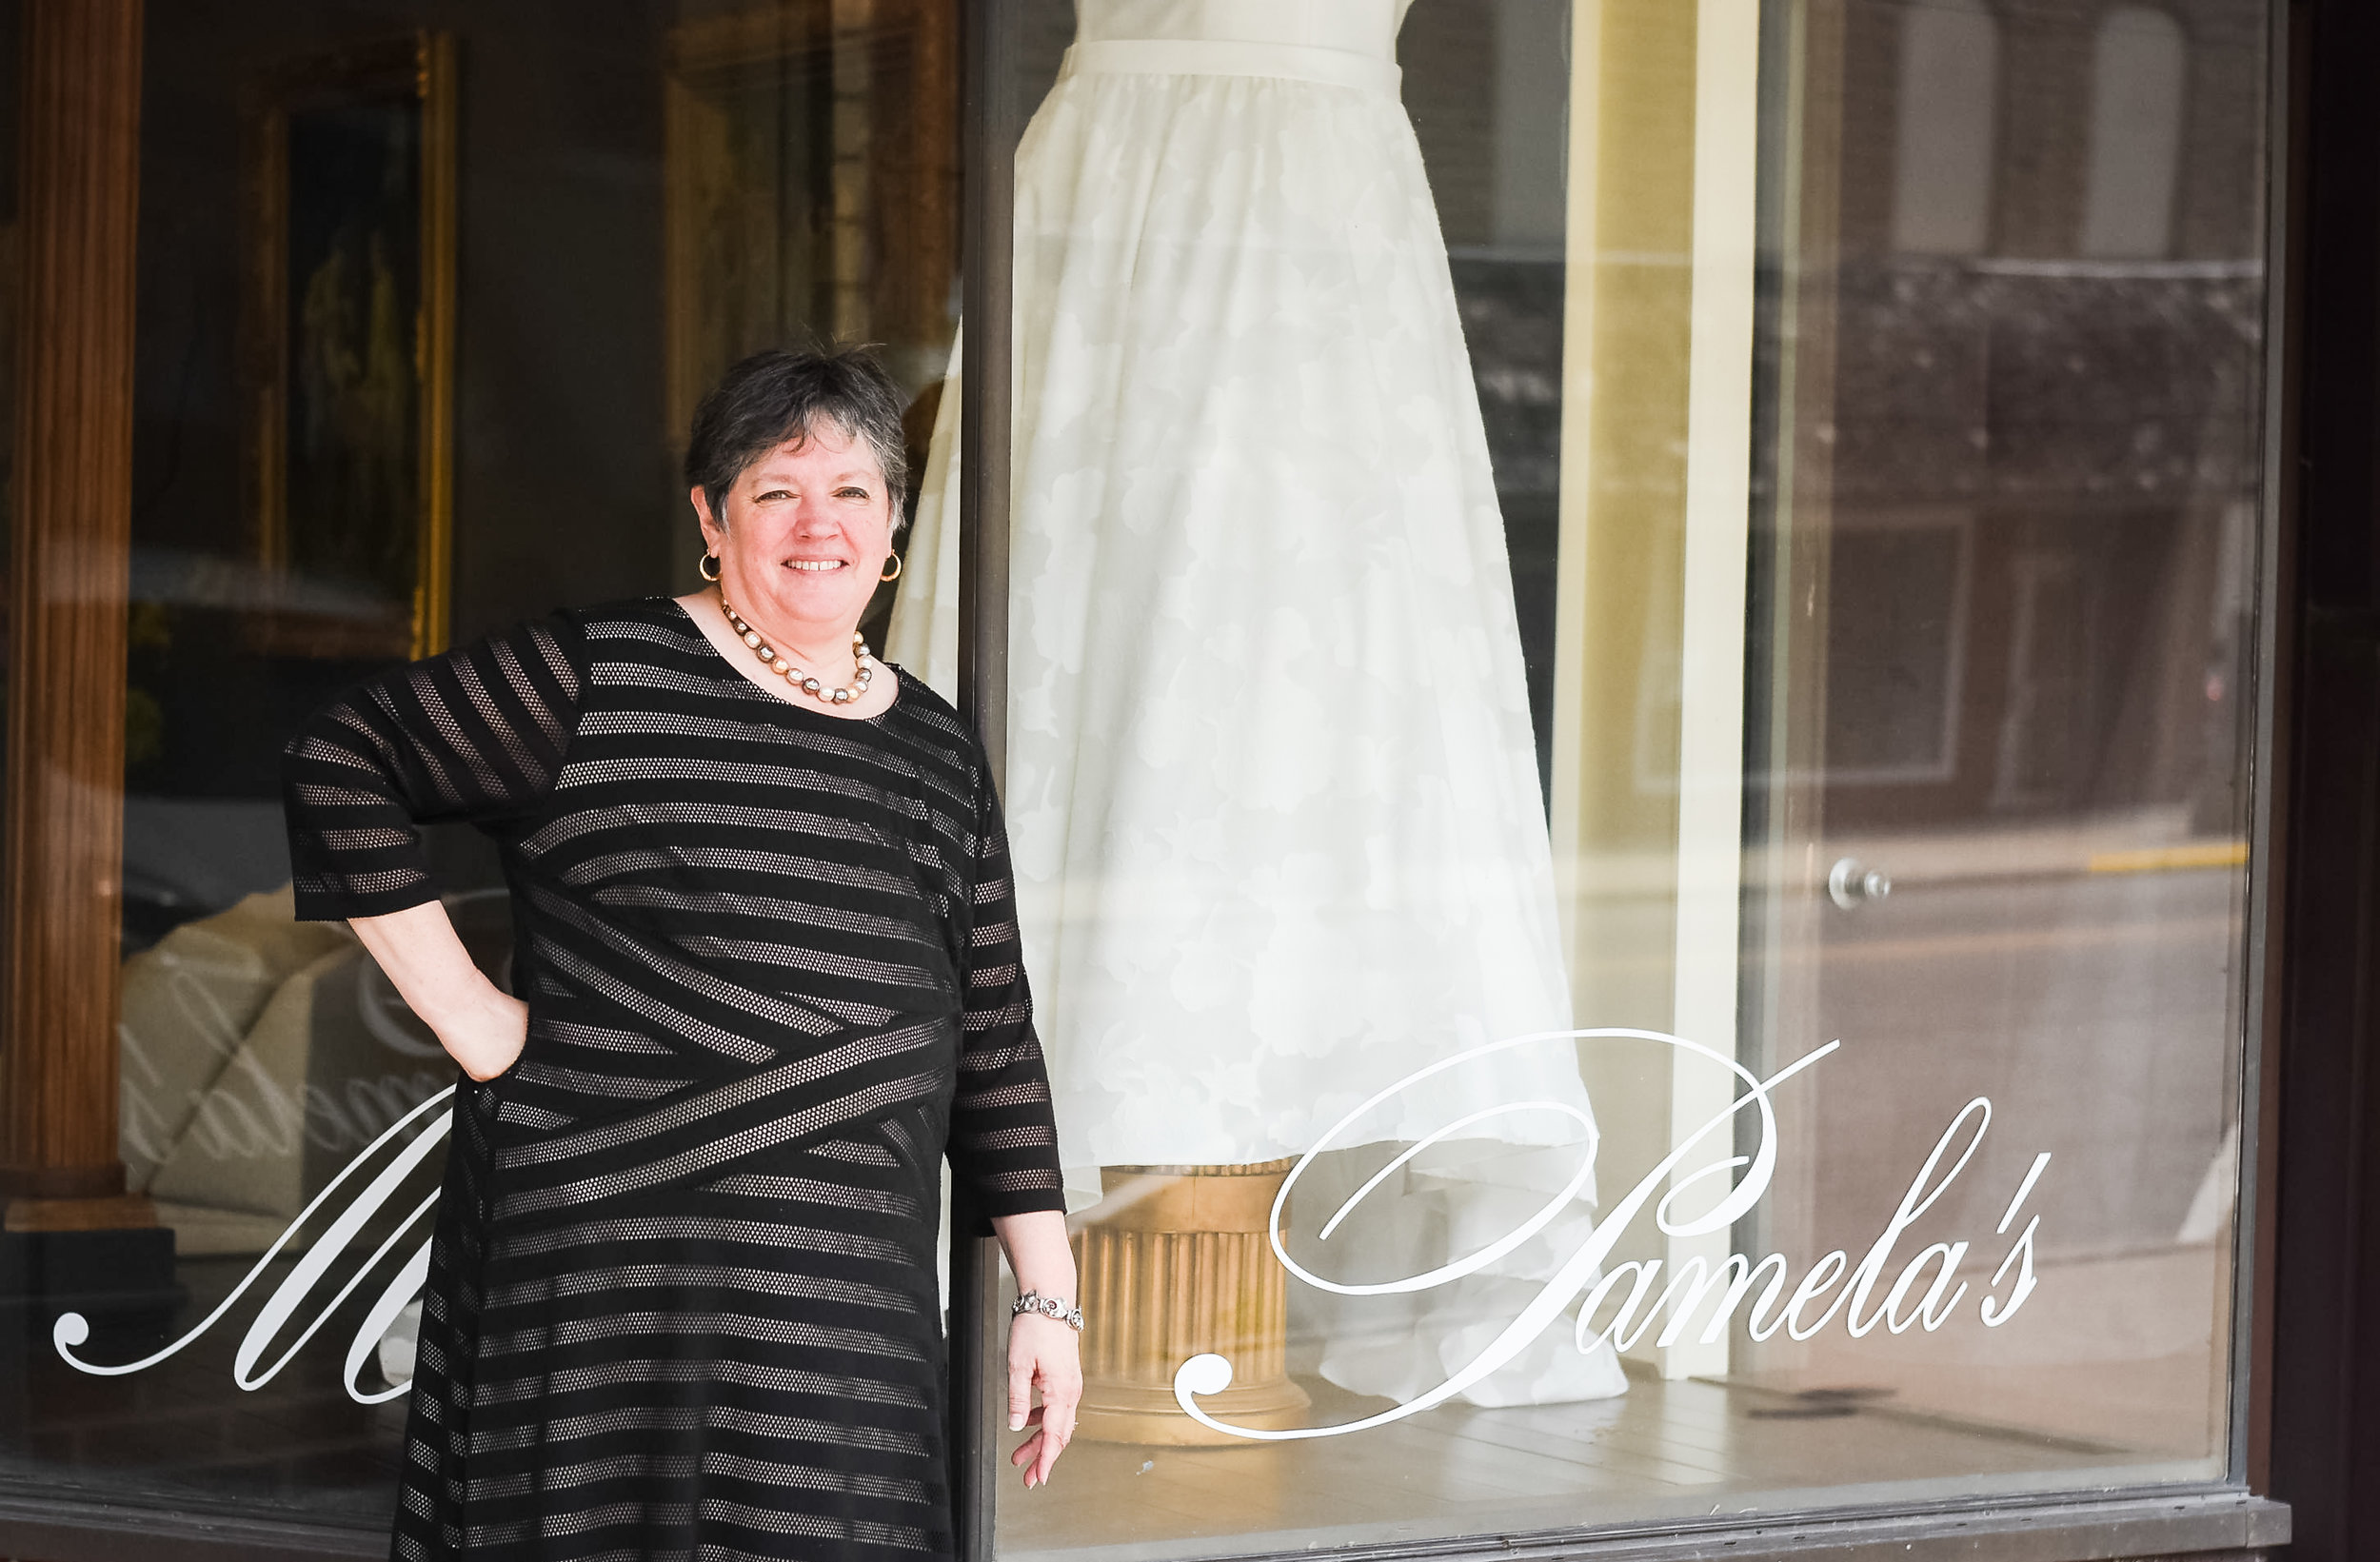 Pamela Inwood, owner, Miss Pamela's – The Plus - Size Bridal Salon